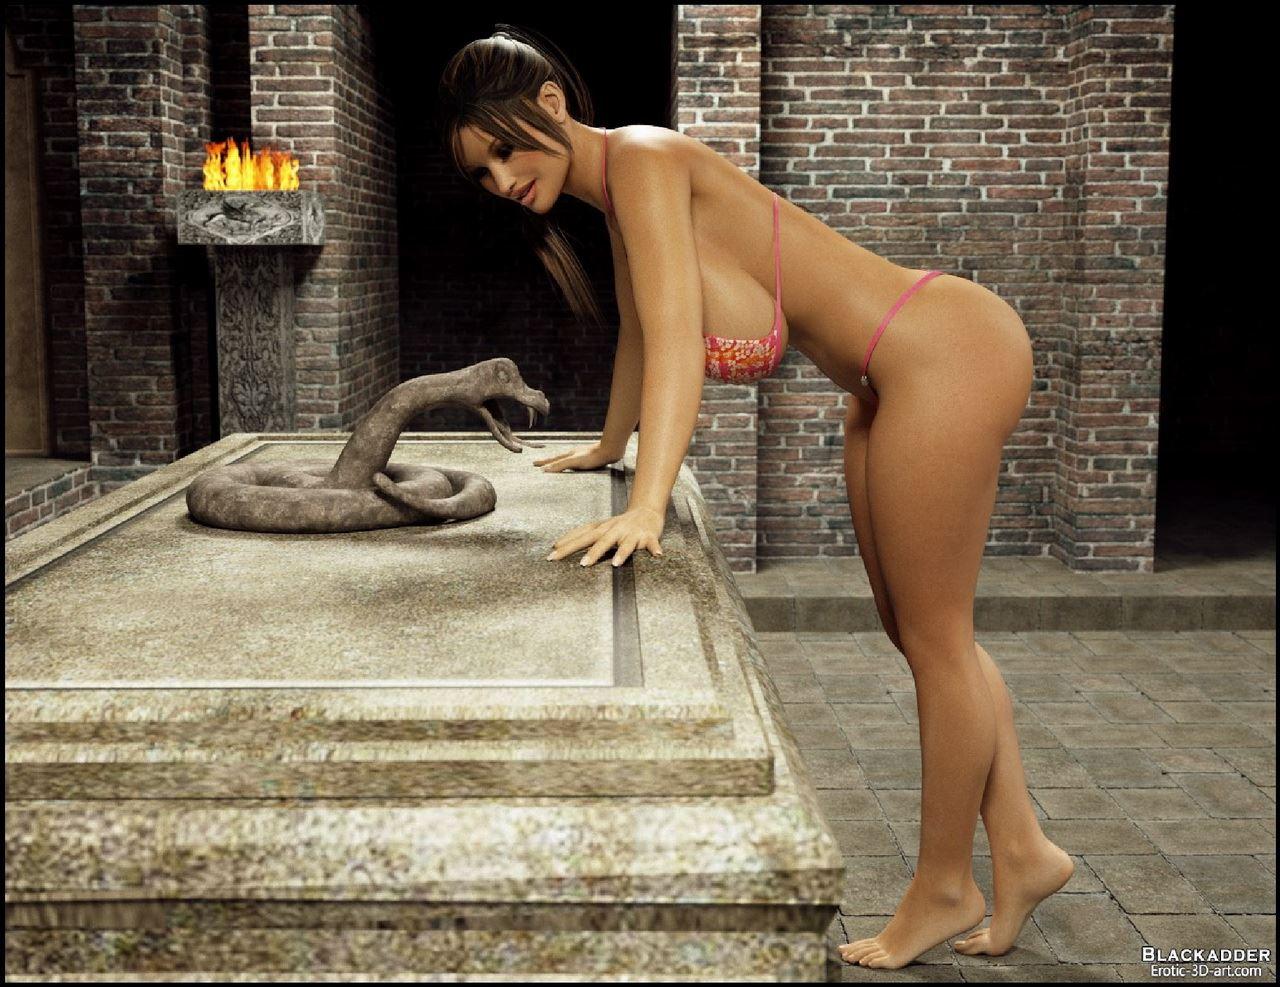 Erotic 3d art lara videos erotic vids